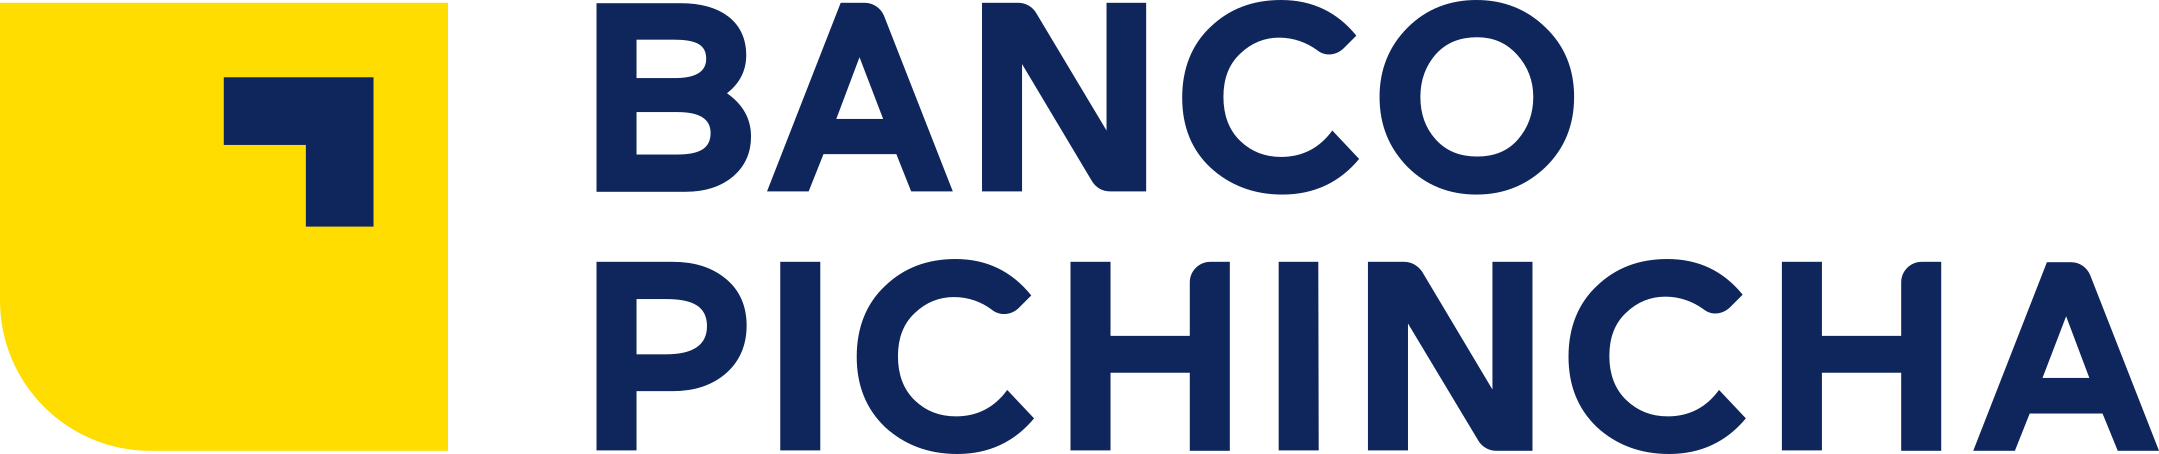 banco pichincha logo 1 - Banco Pichincha Logo